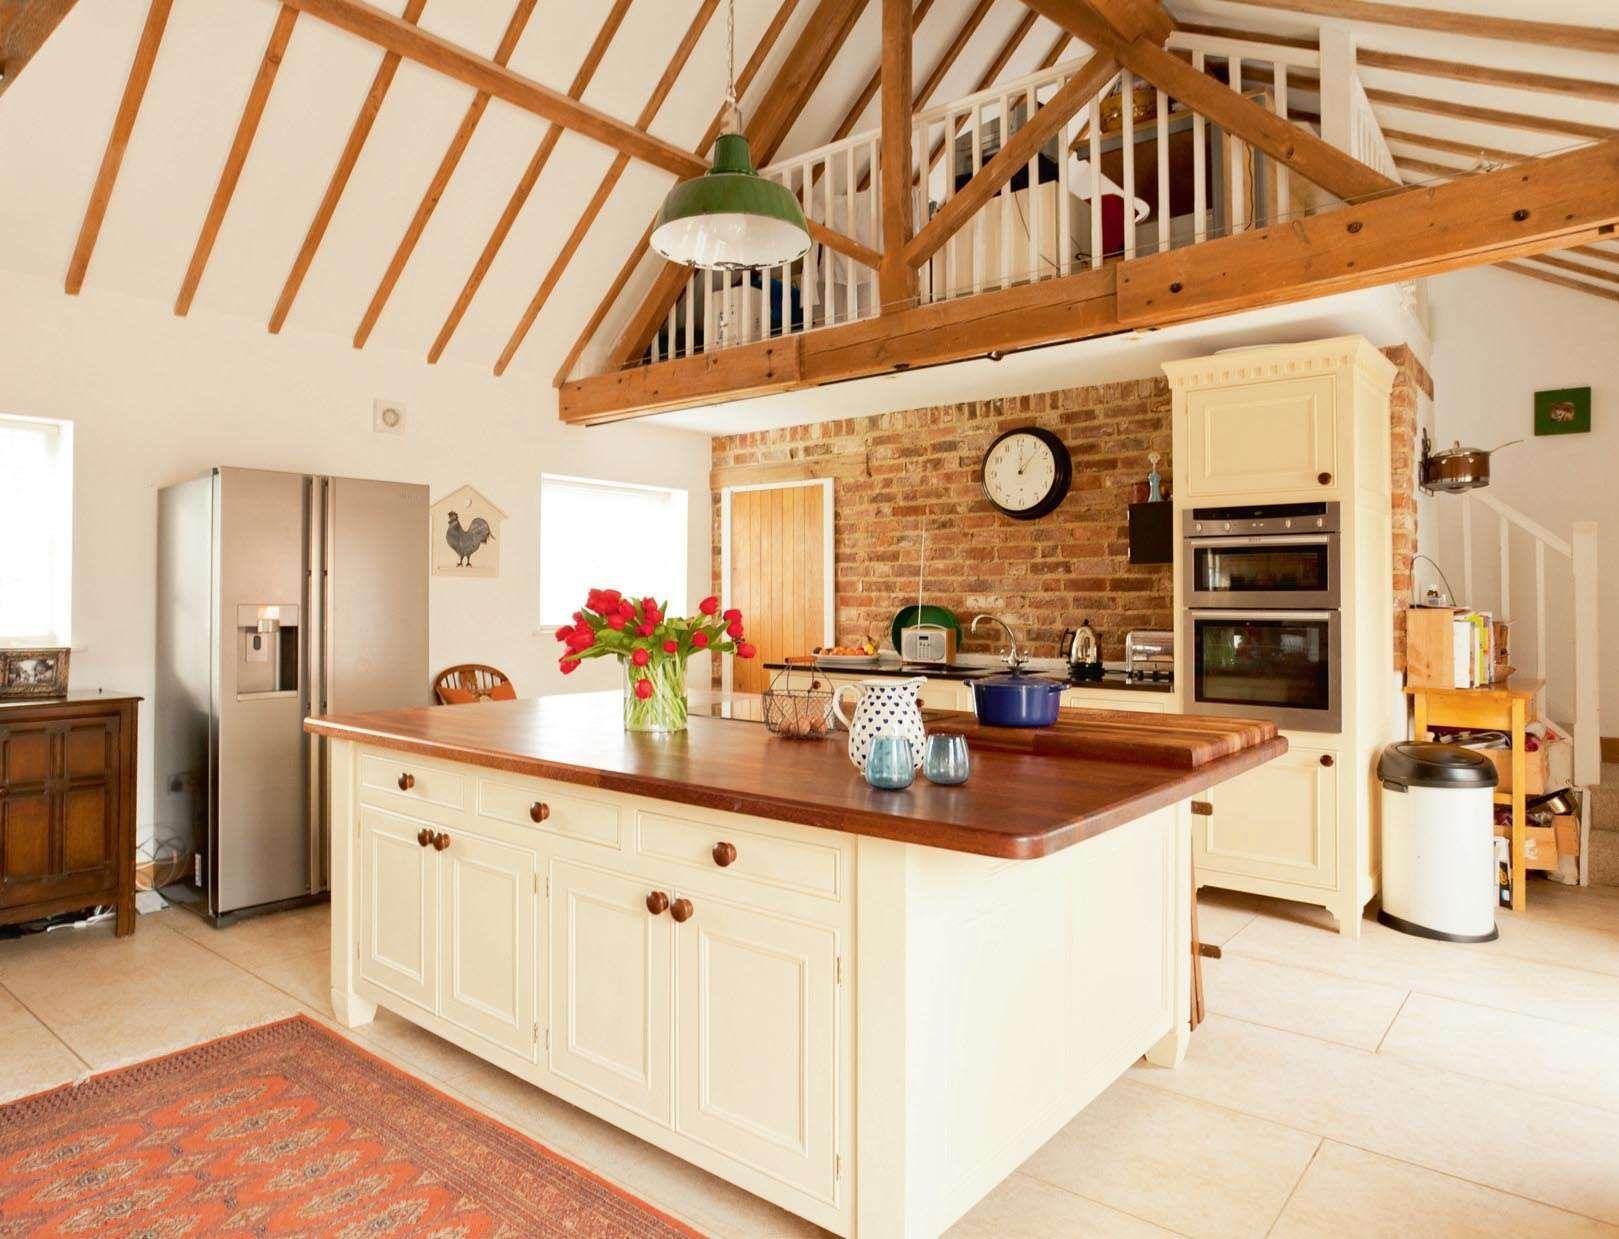 Barn House Kitchen Mahogany Cabinets Conversion Home Ideas Decor Barndominium